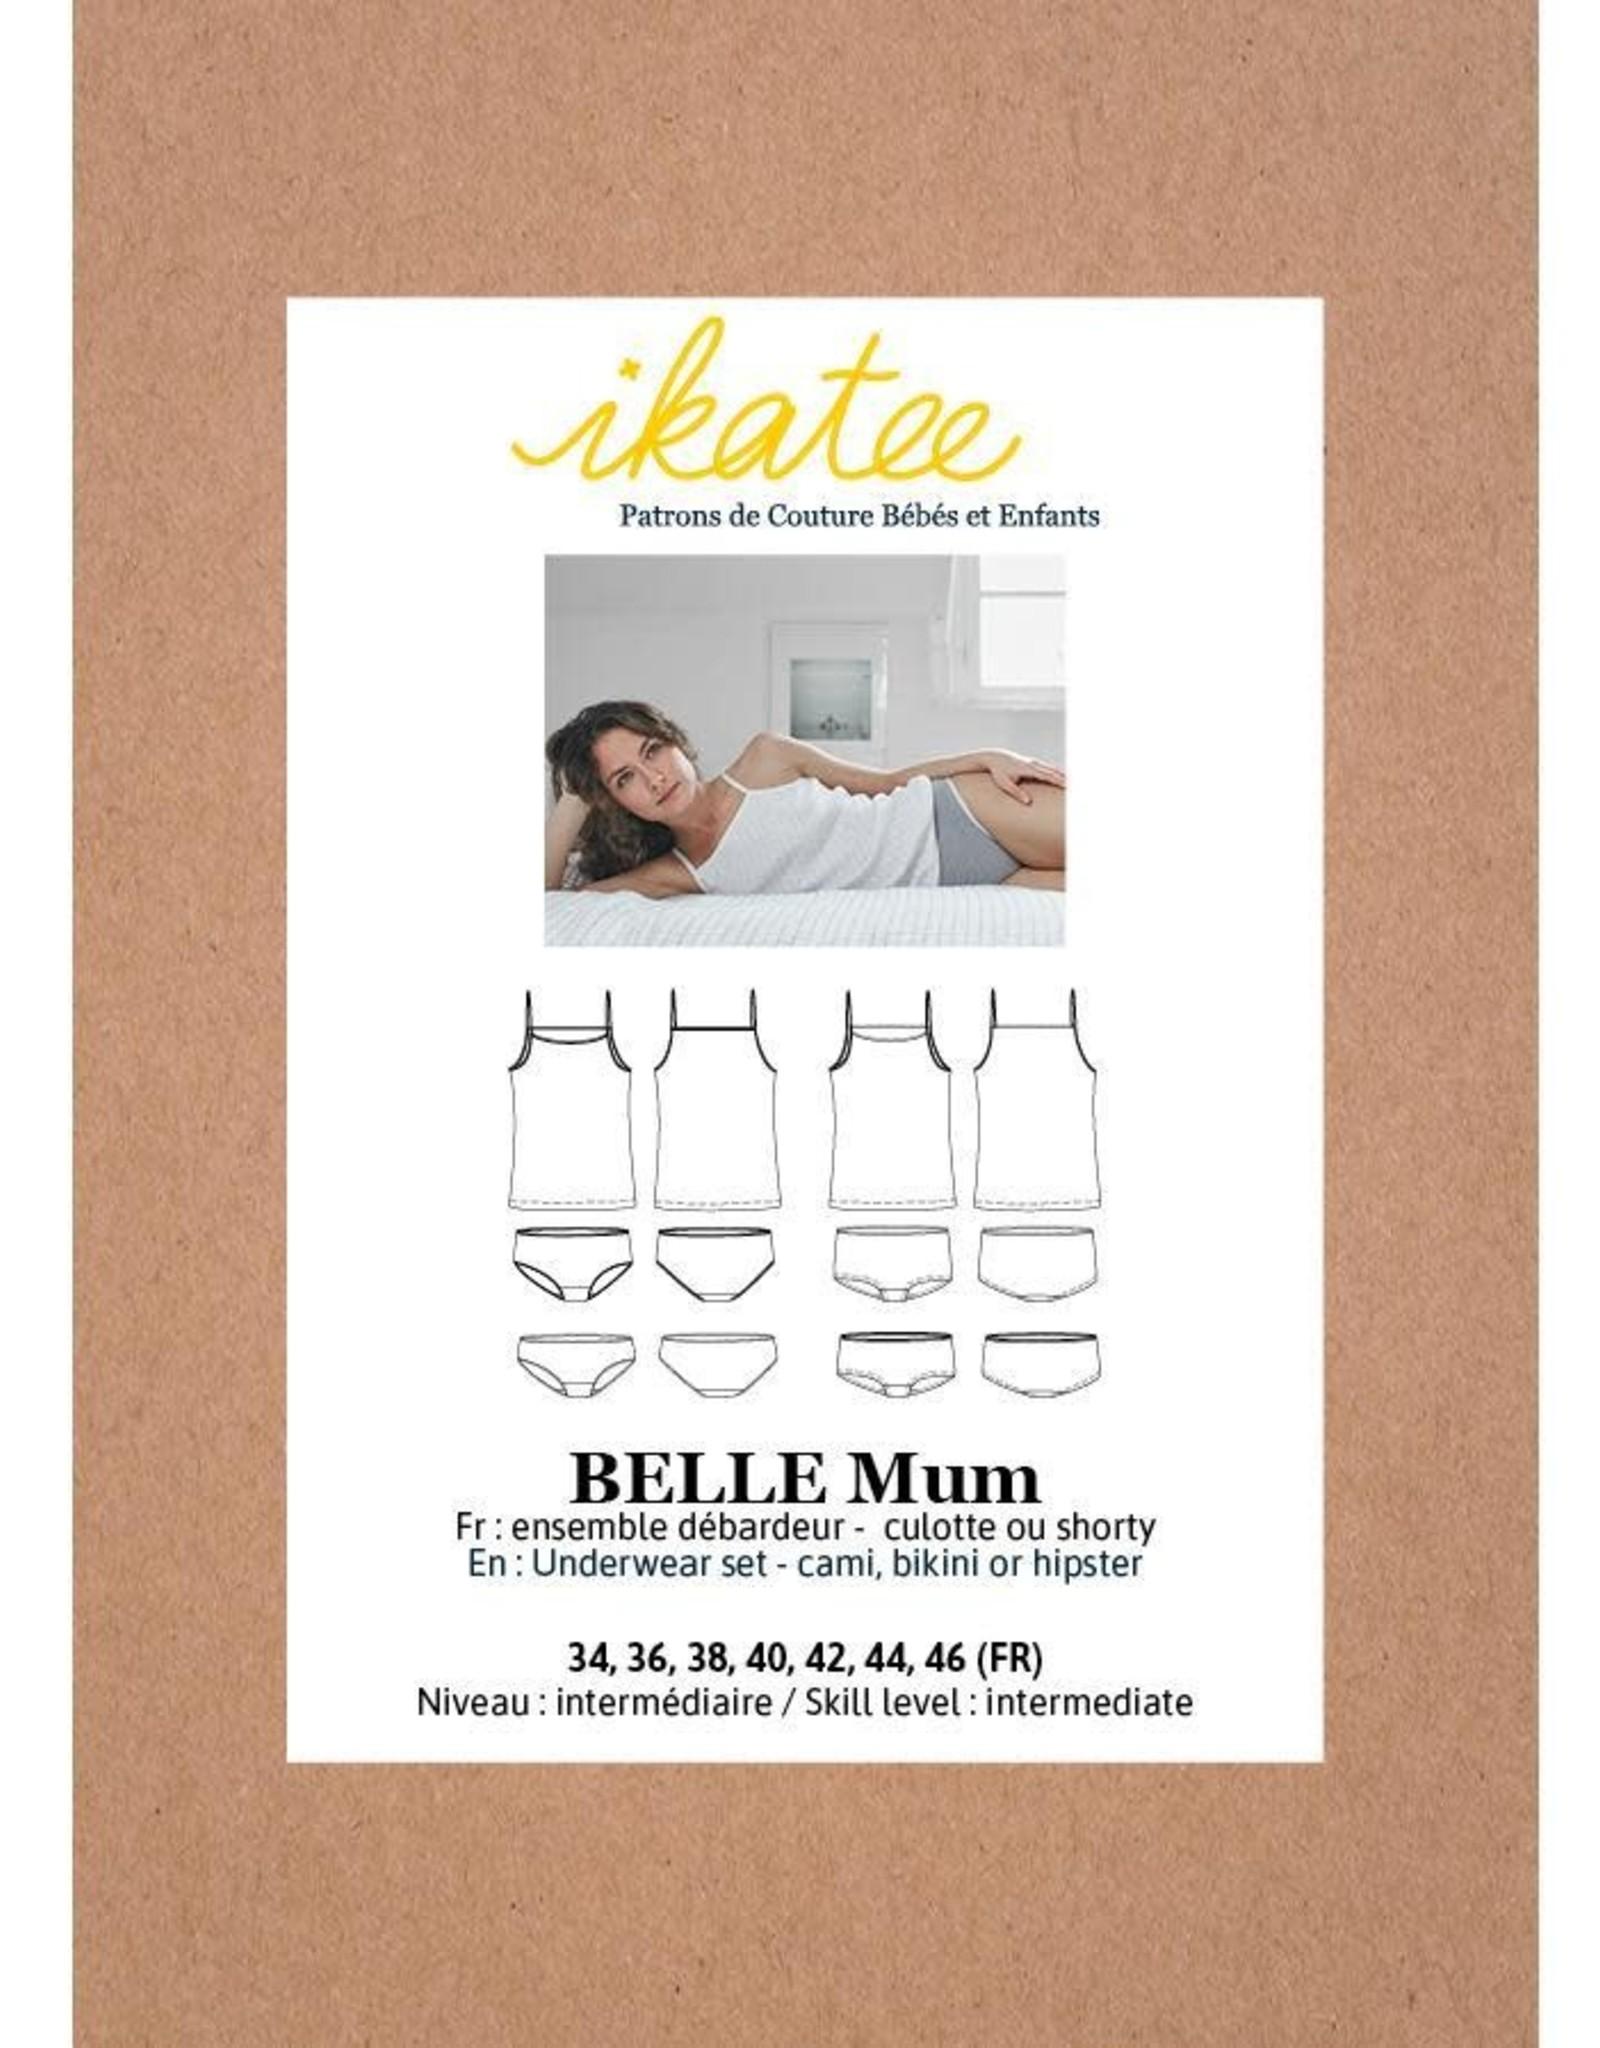 Ikatee Belle mum underwear set